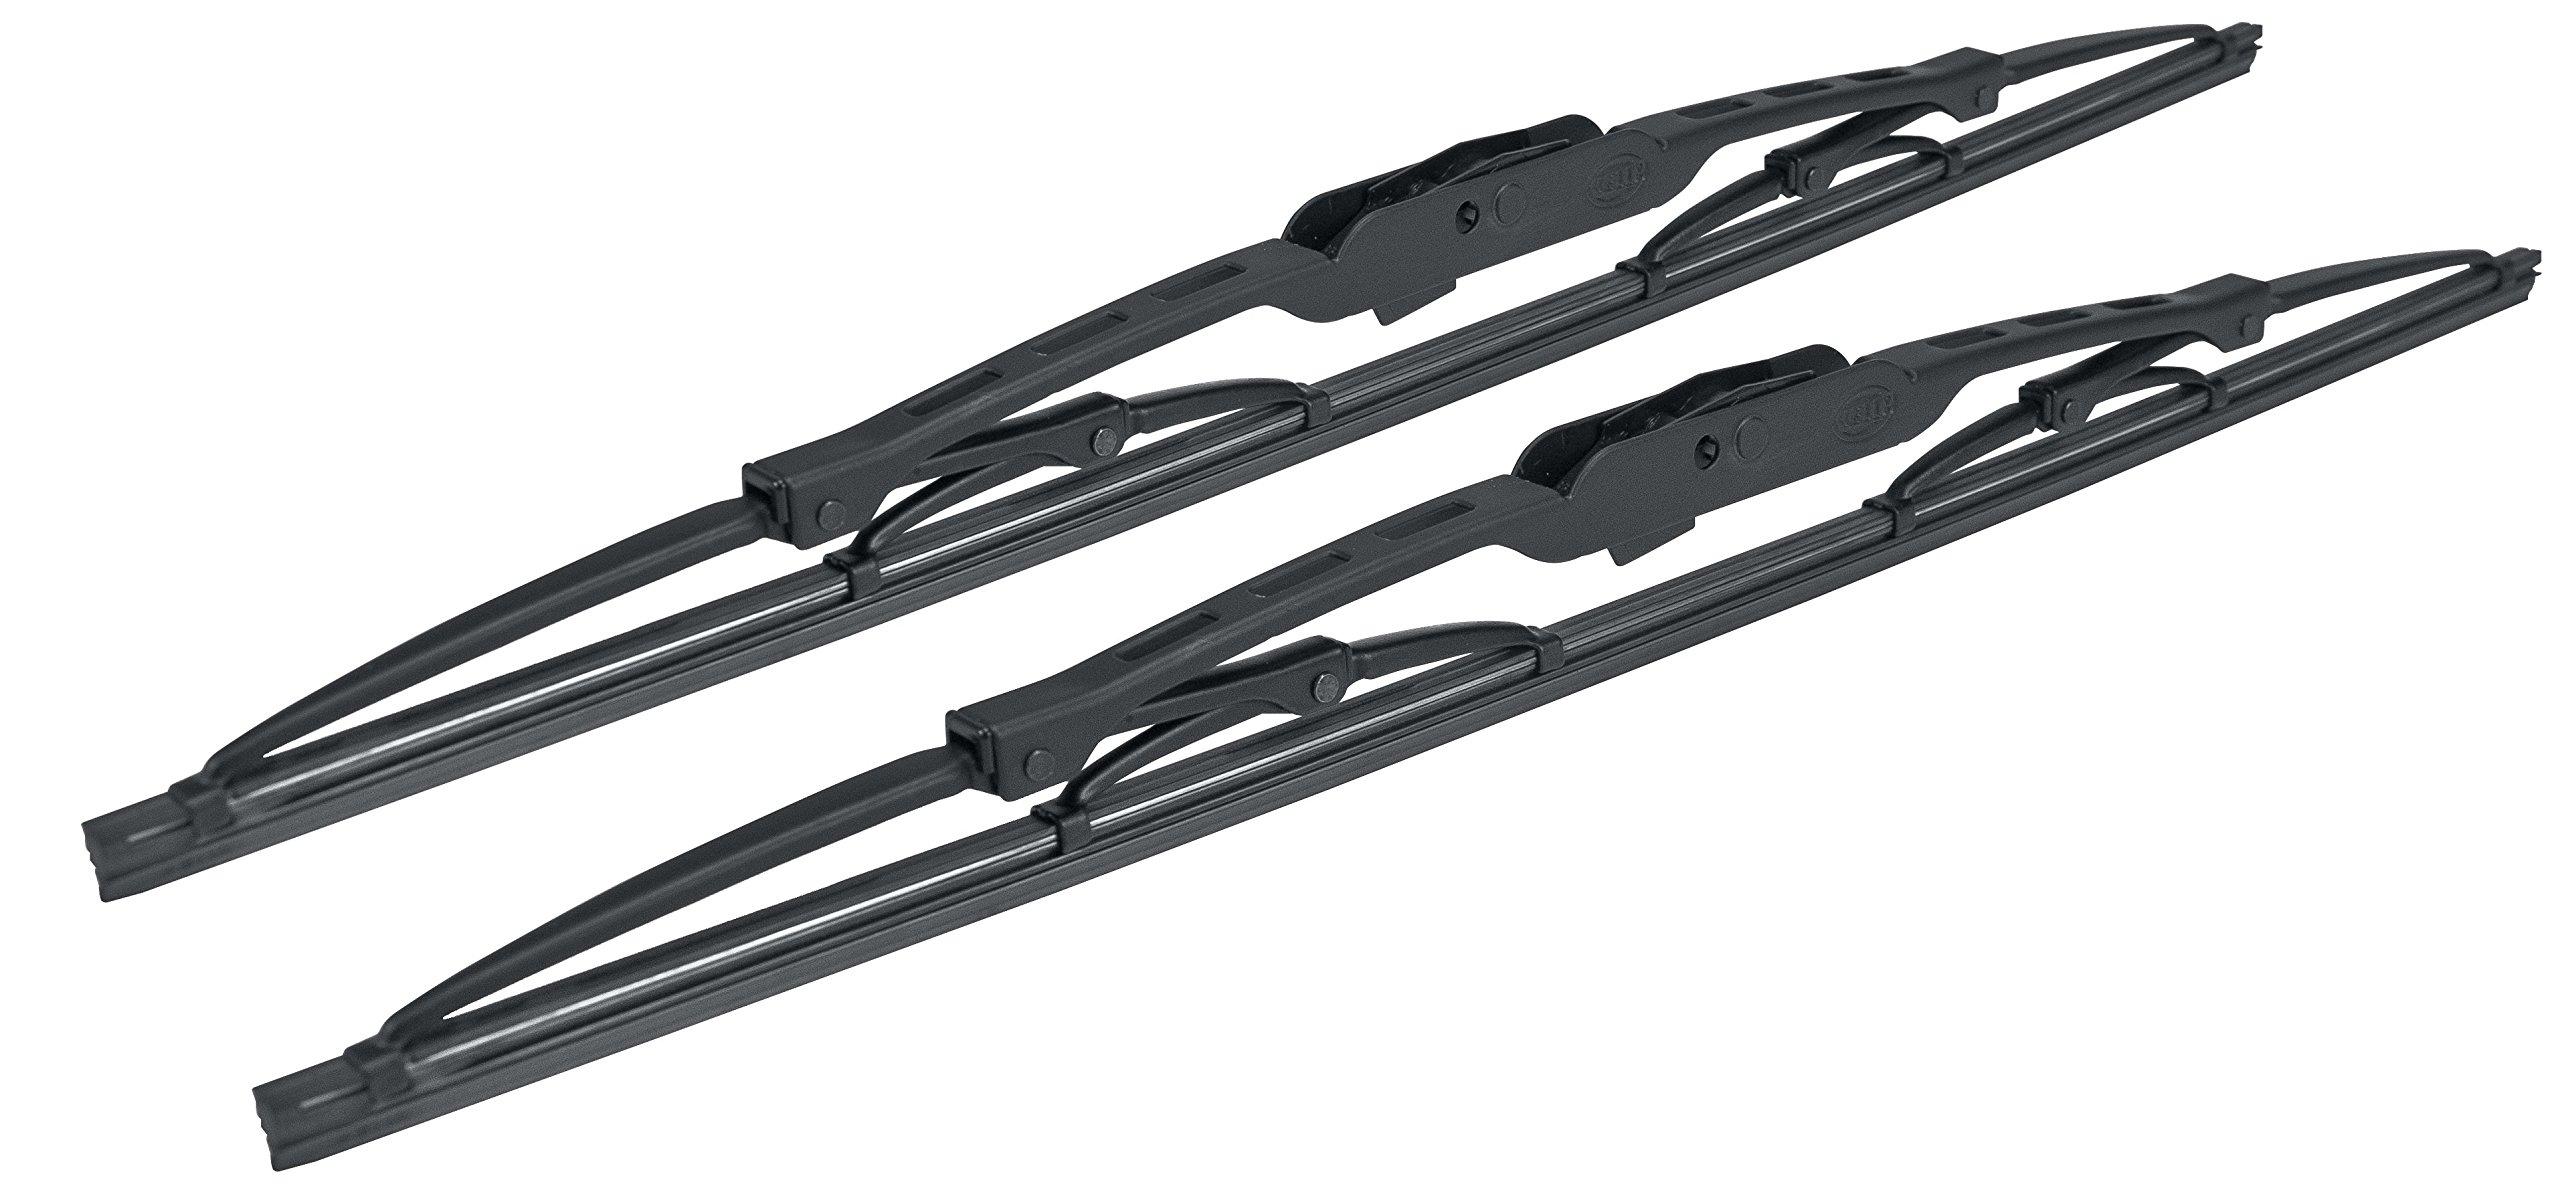 HELLA 9XW398114018 Standard Wiper Blade, 18'', Pair by HELLA